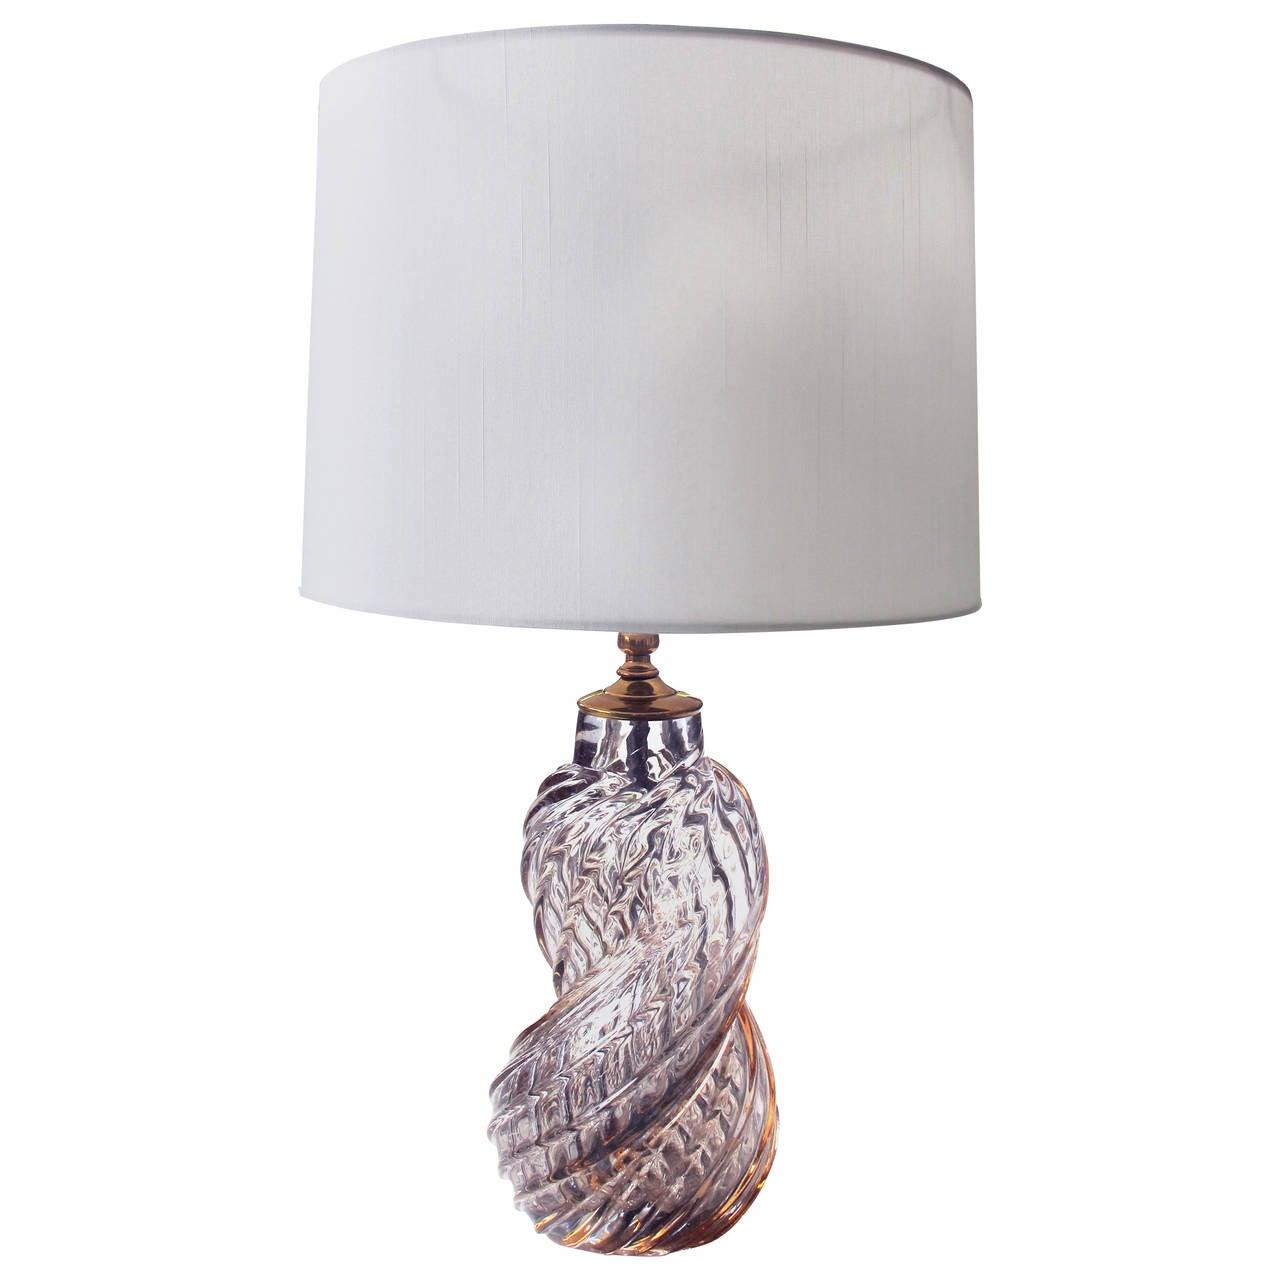 Murano 1960s helix form lamp of aubergine art glass by barbini at murano 1960s helix form lamp of aubergine art glass by barbini 1 geotapseo Choice Image